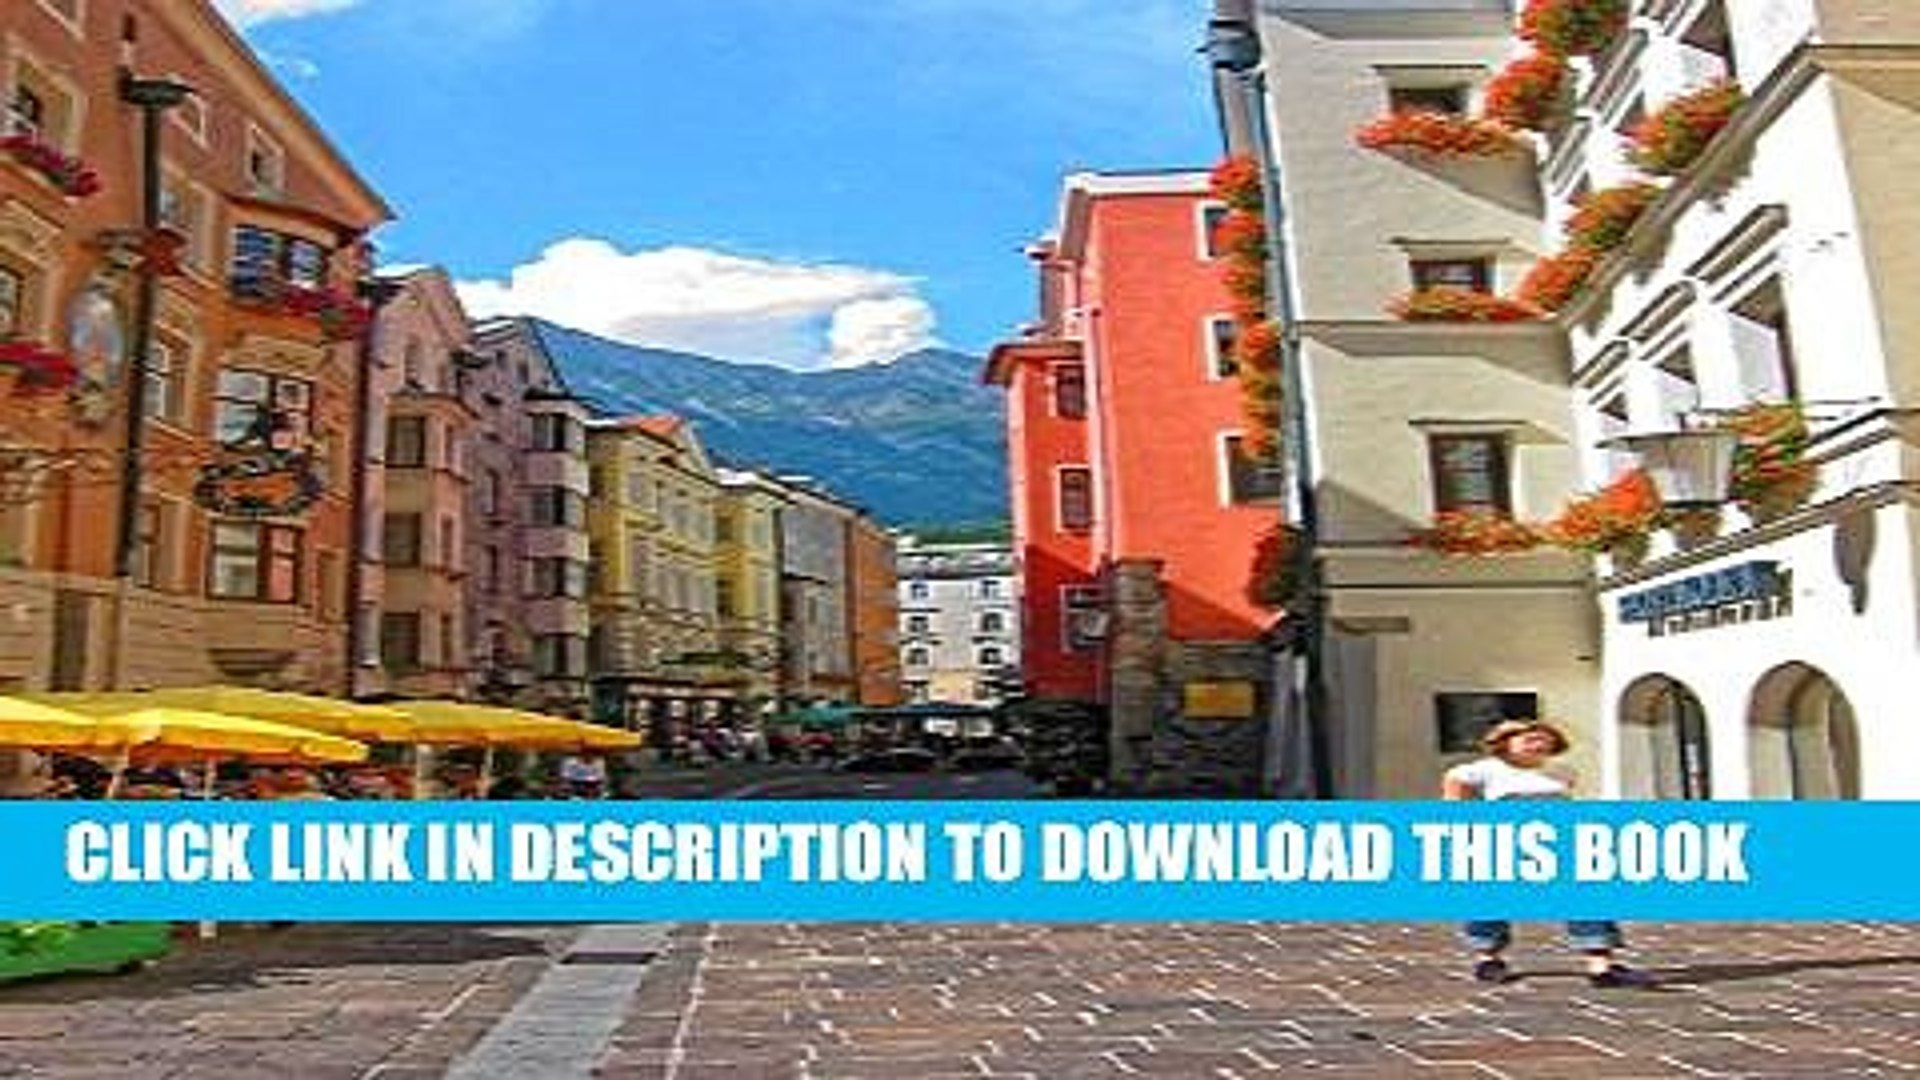 [PDF] Innsbruck - Austrian Alpine Paradise: Photo Gallery (Austria 2002) Popular Collection